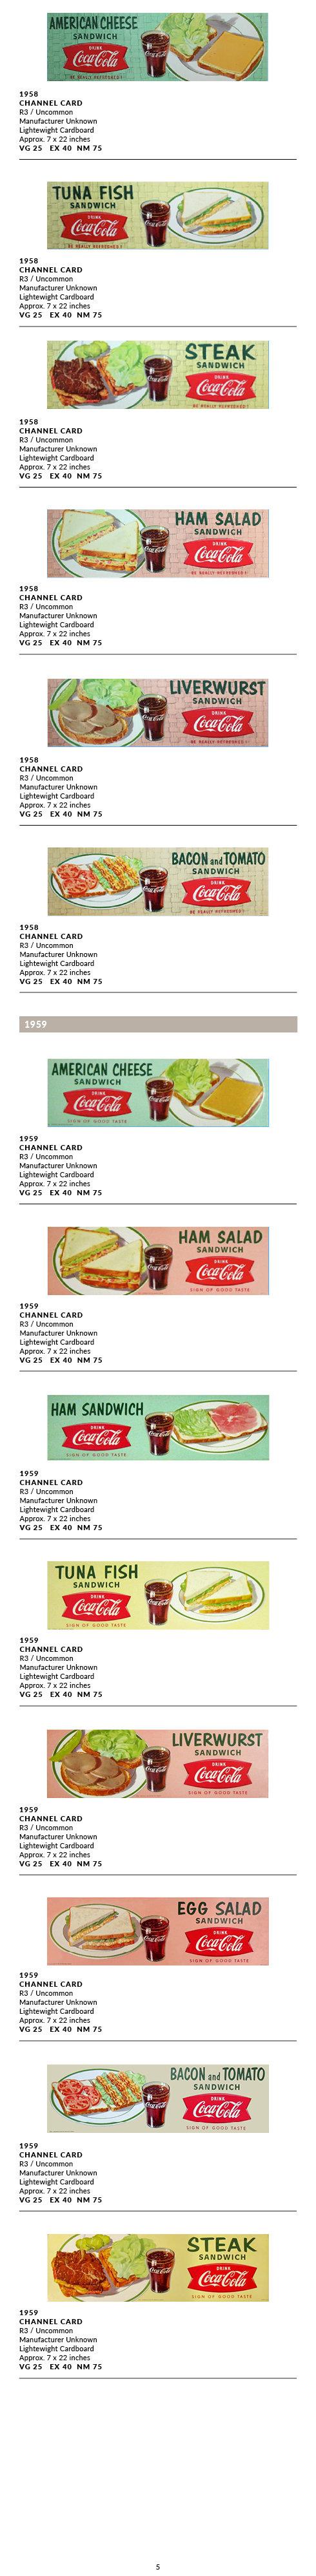 Food Channel Card5.jpg